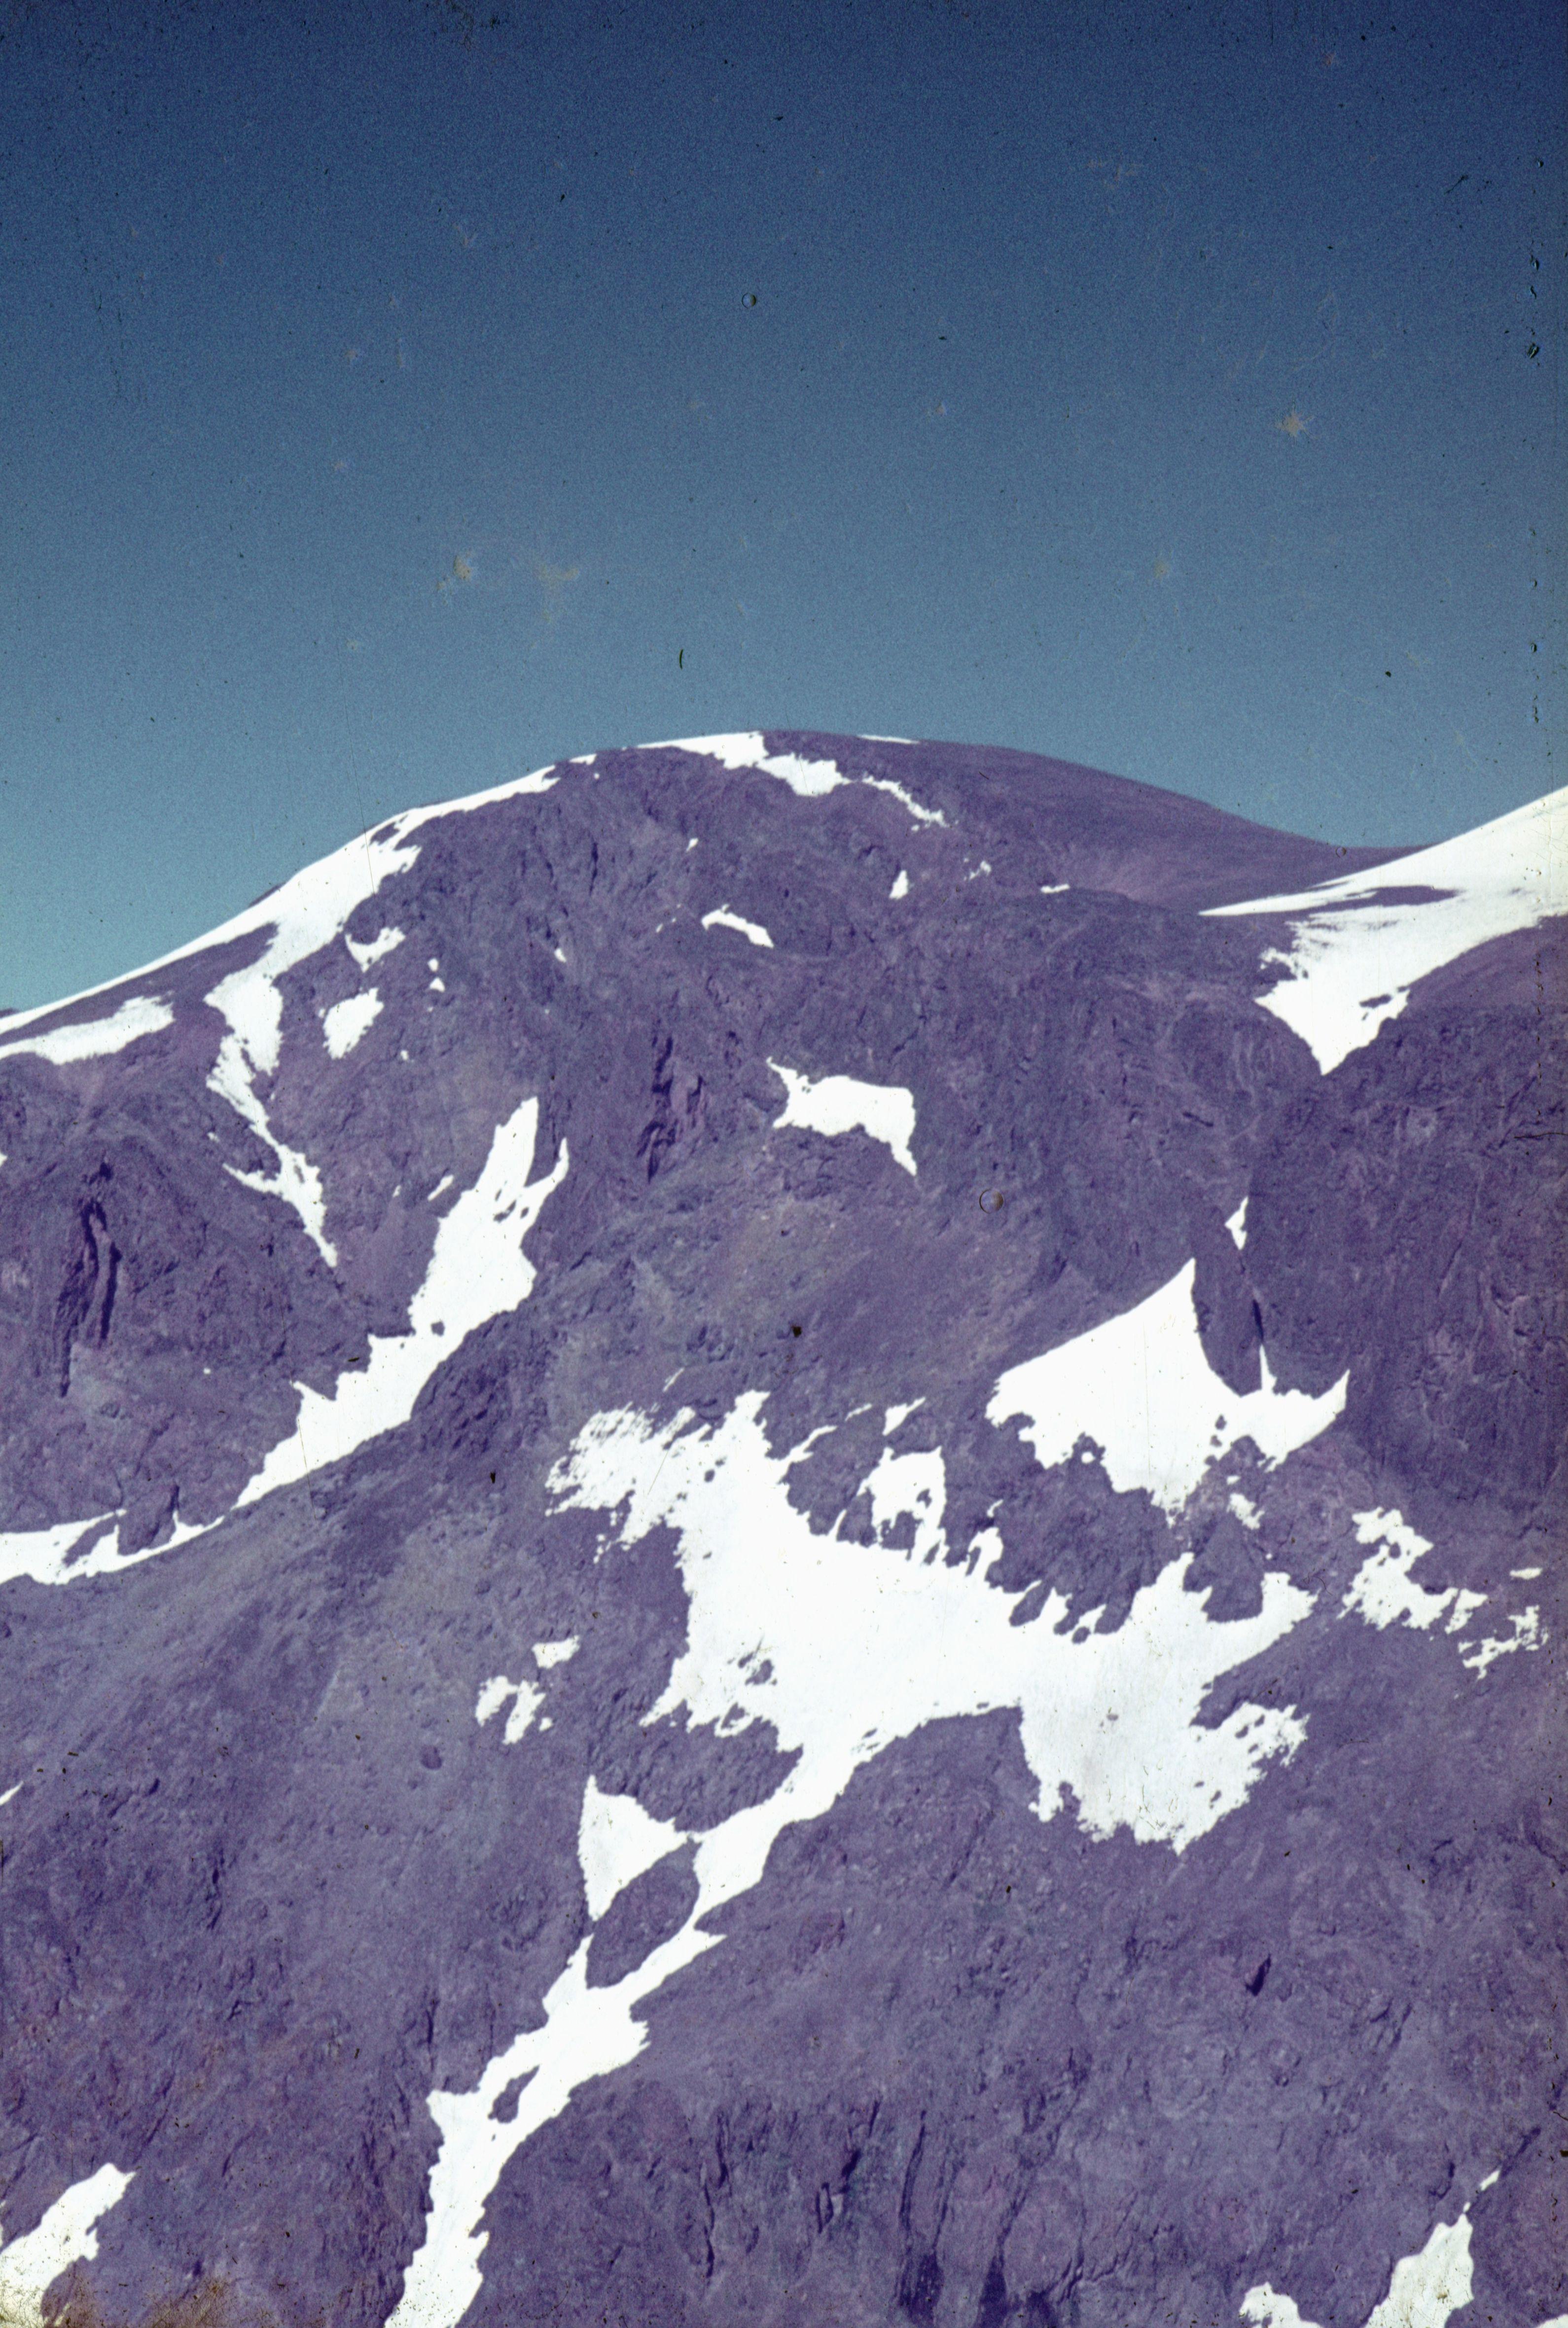 cim del ras n ́0uanoulcrim 4,083 m